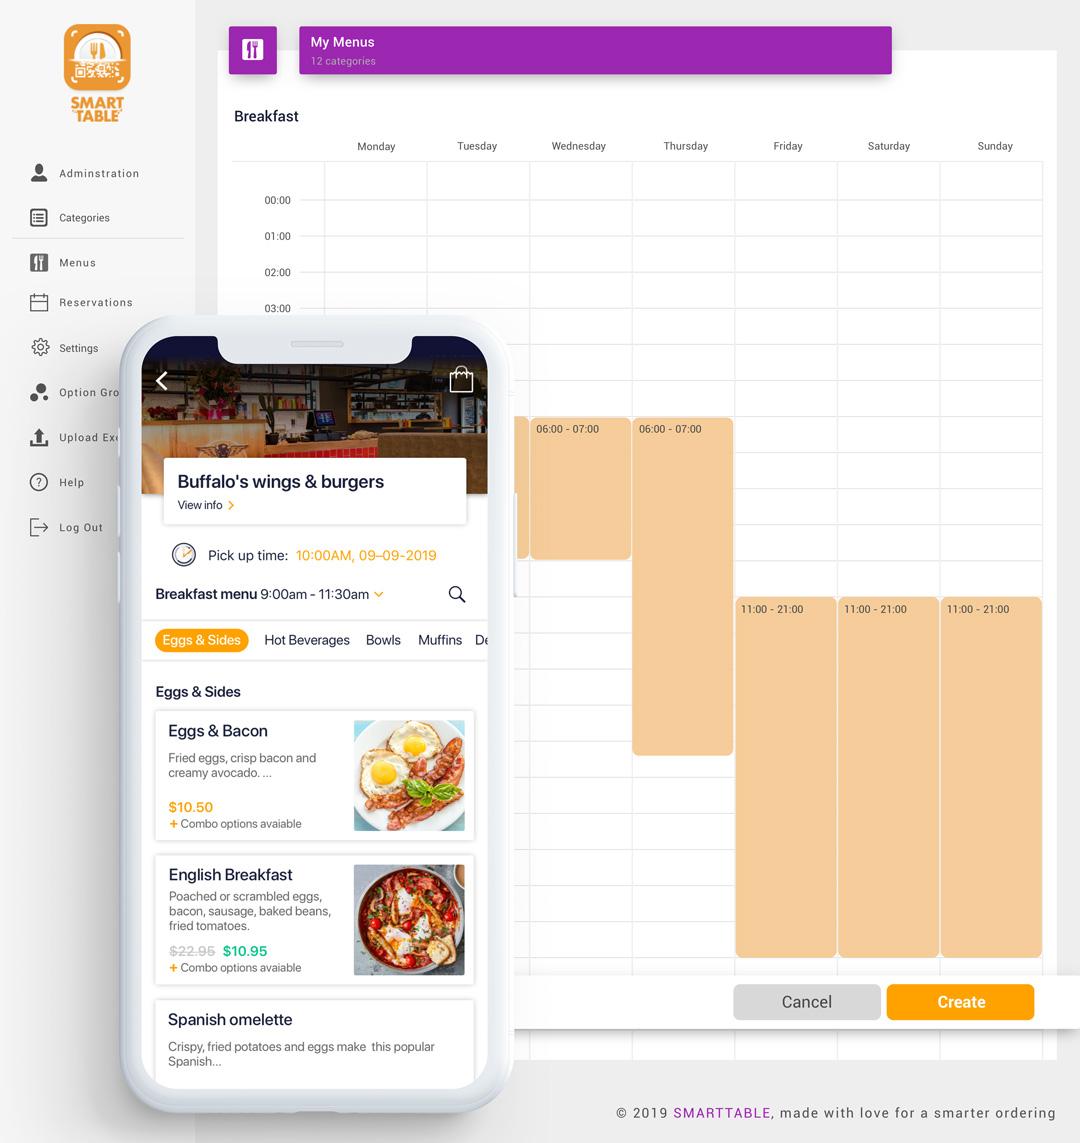 time based menus